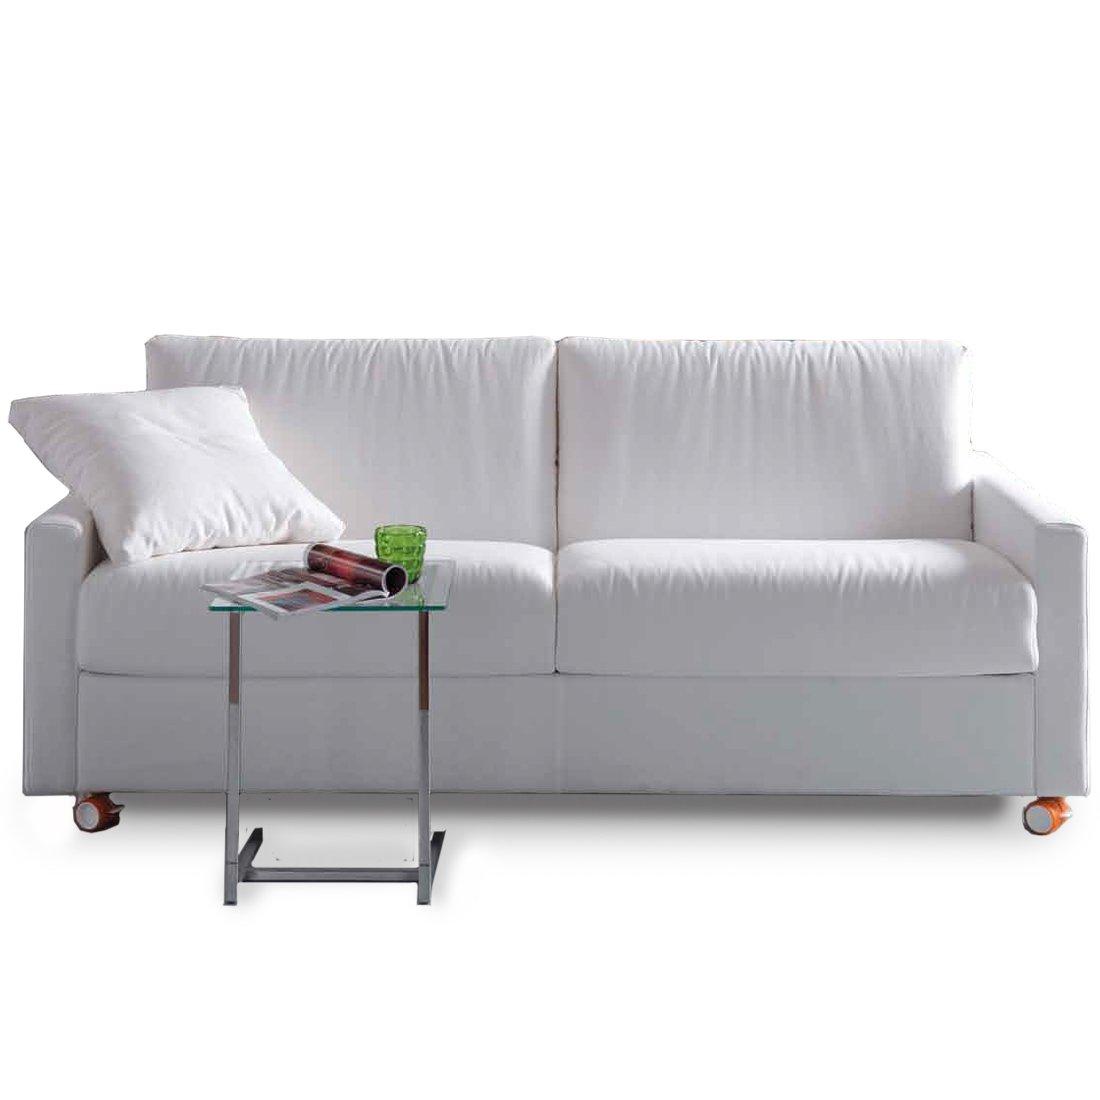 canap convertible montparnasse meubles et atmosph re. Black Bedroom Furniture Sets. Home Design Ideas